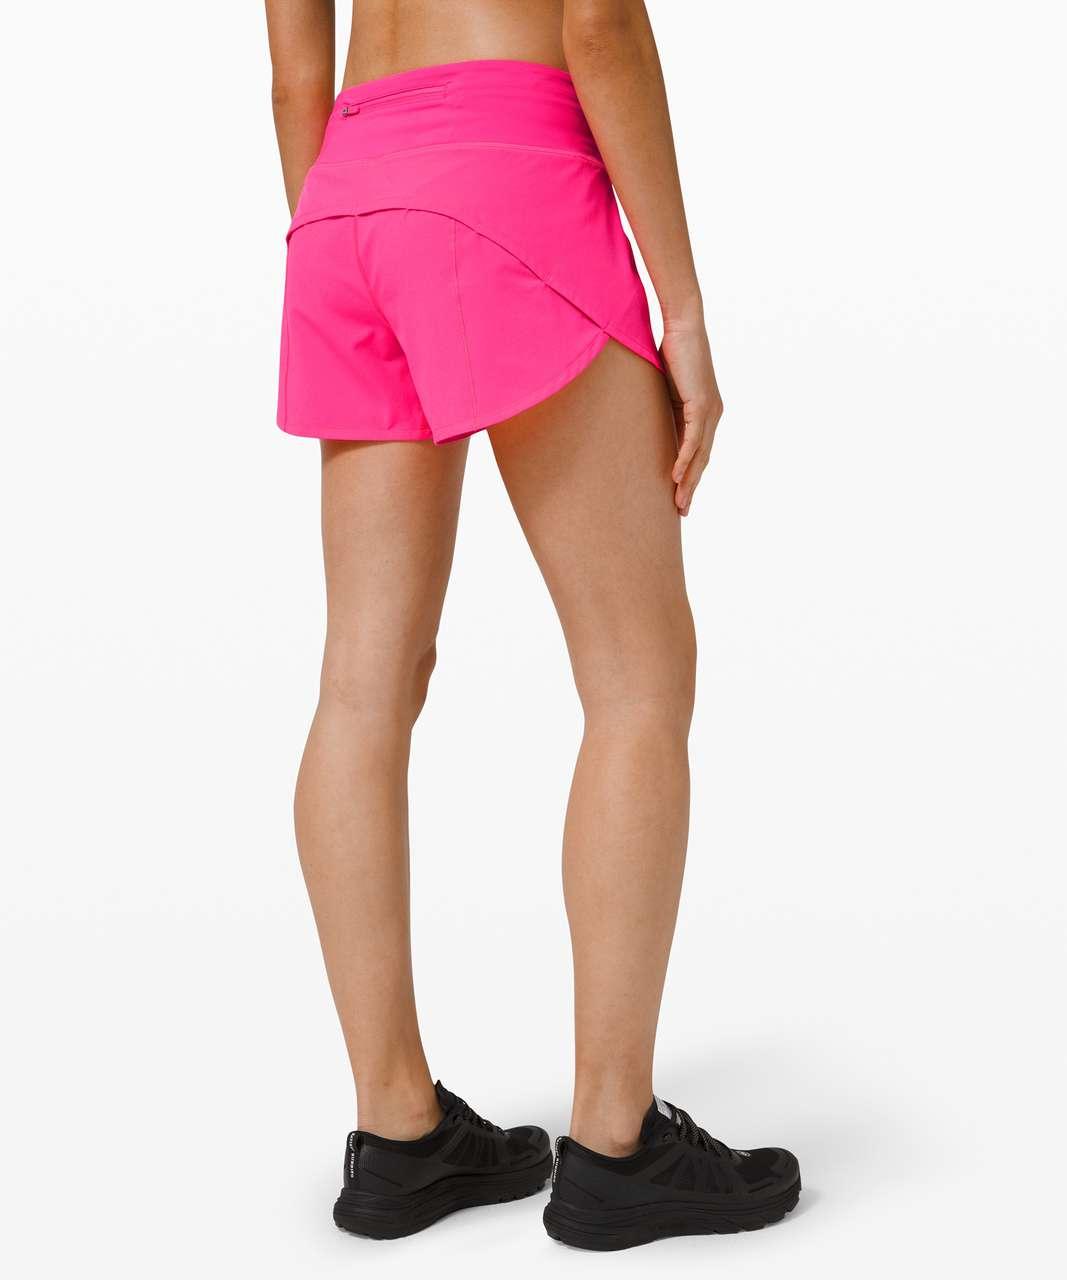 Lululemon Speed Up Short Long 4 Updated Fit Pink Highlight Lulu Fanatics